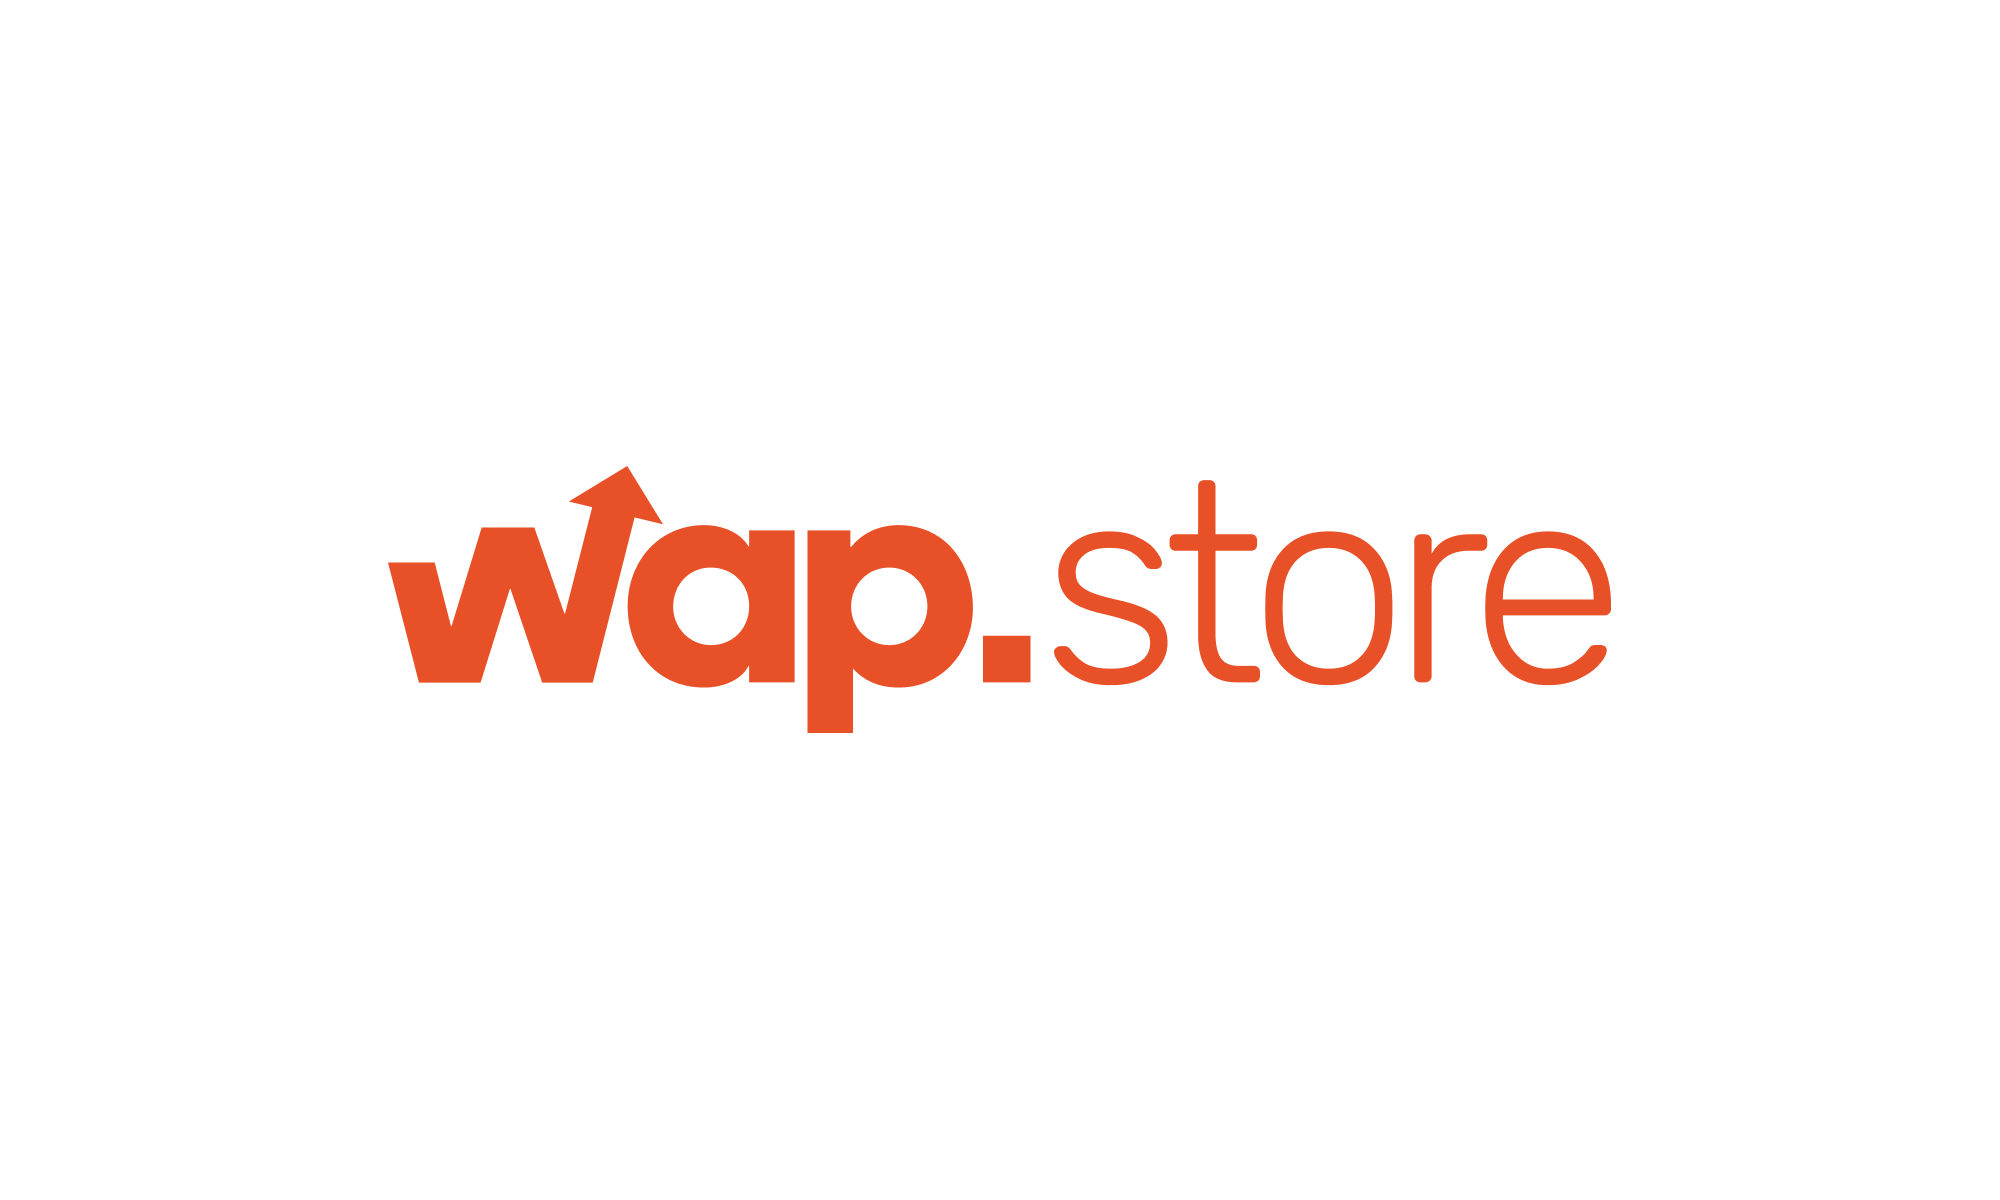 Logo wapstore